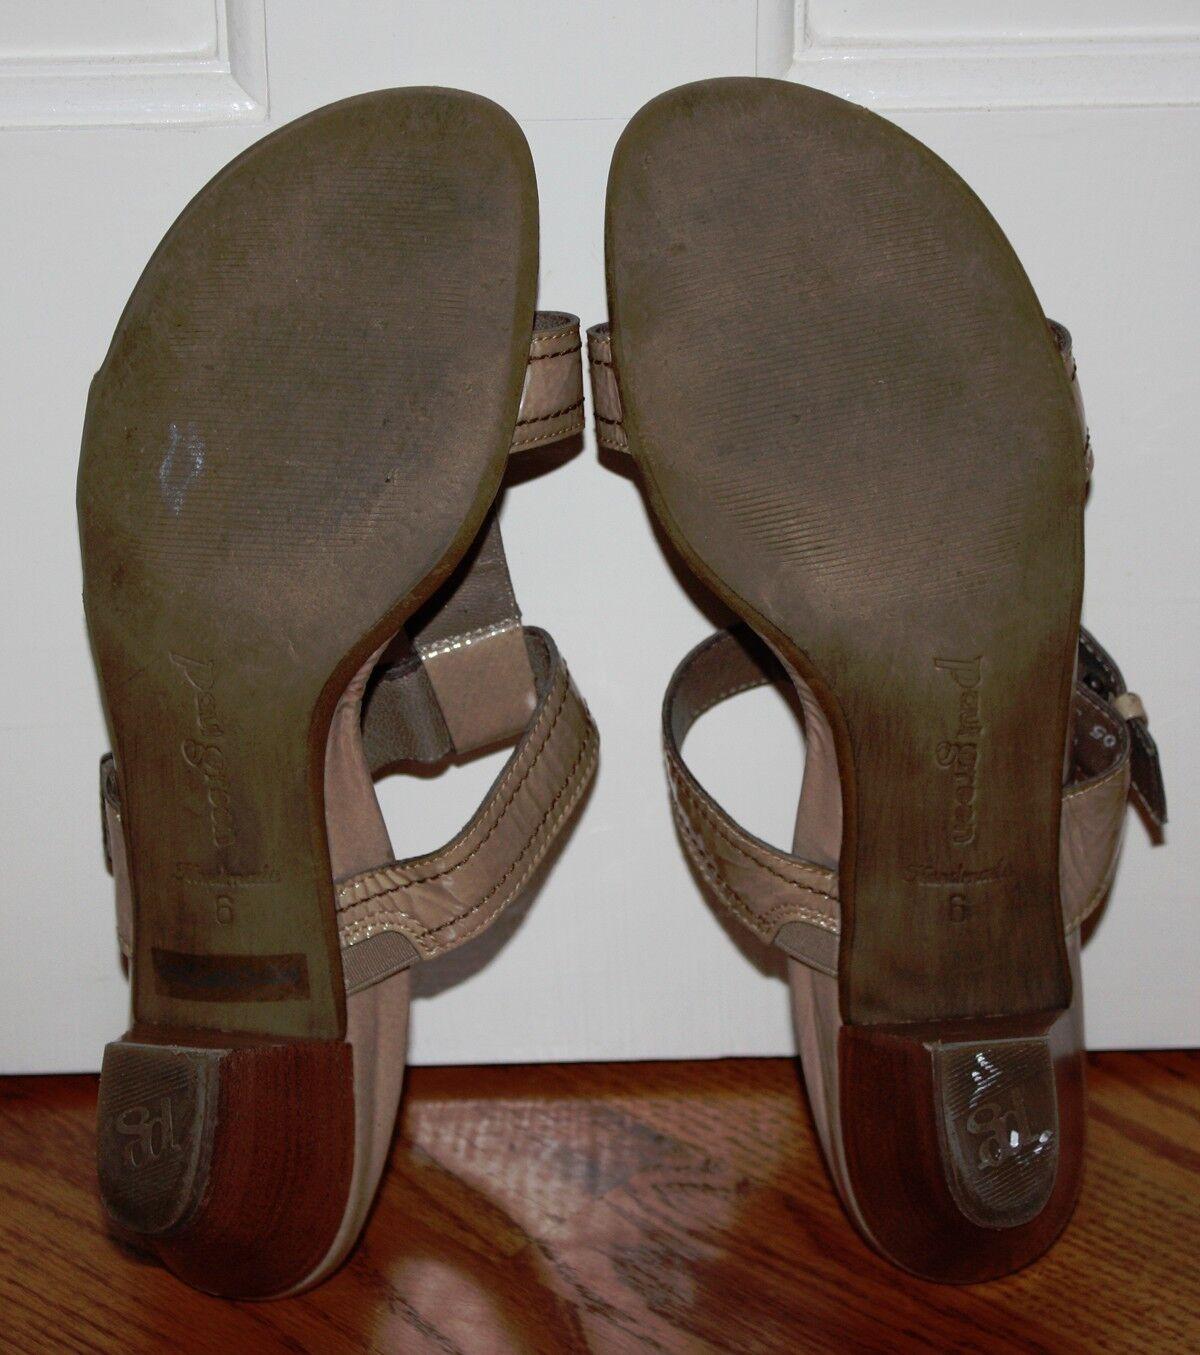 donna Paul verde Tan Tan Tan Patent Leather Sandal Heels Dimensione 6   US 8.5 febb02